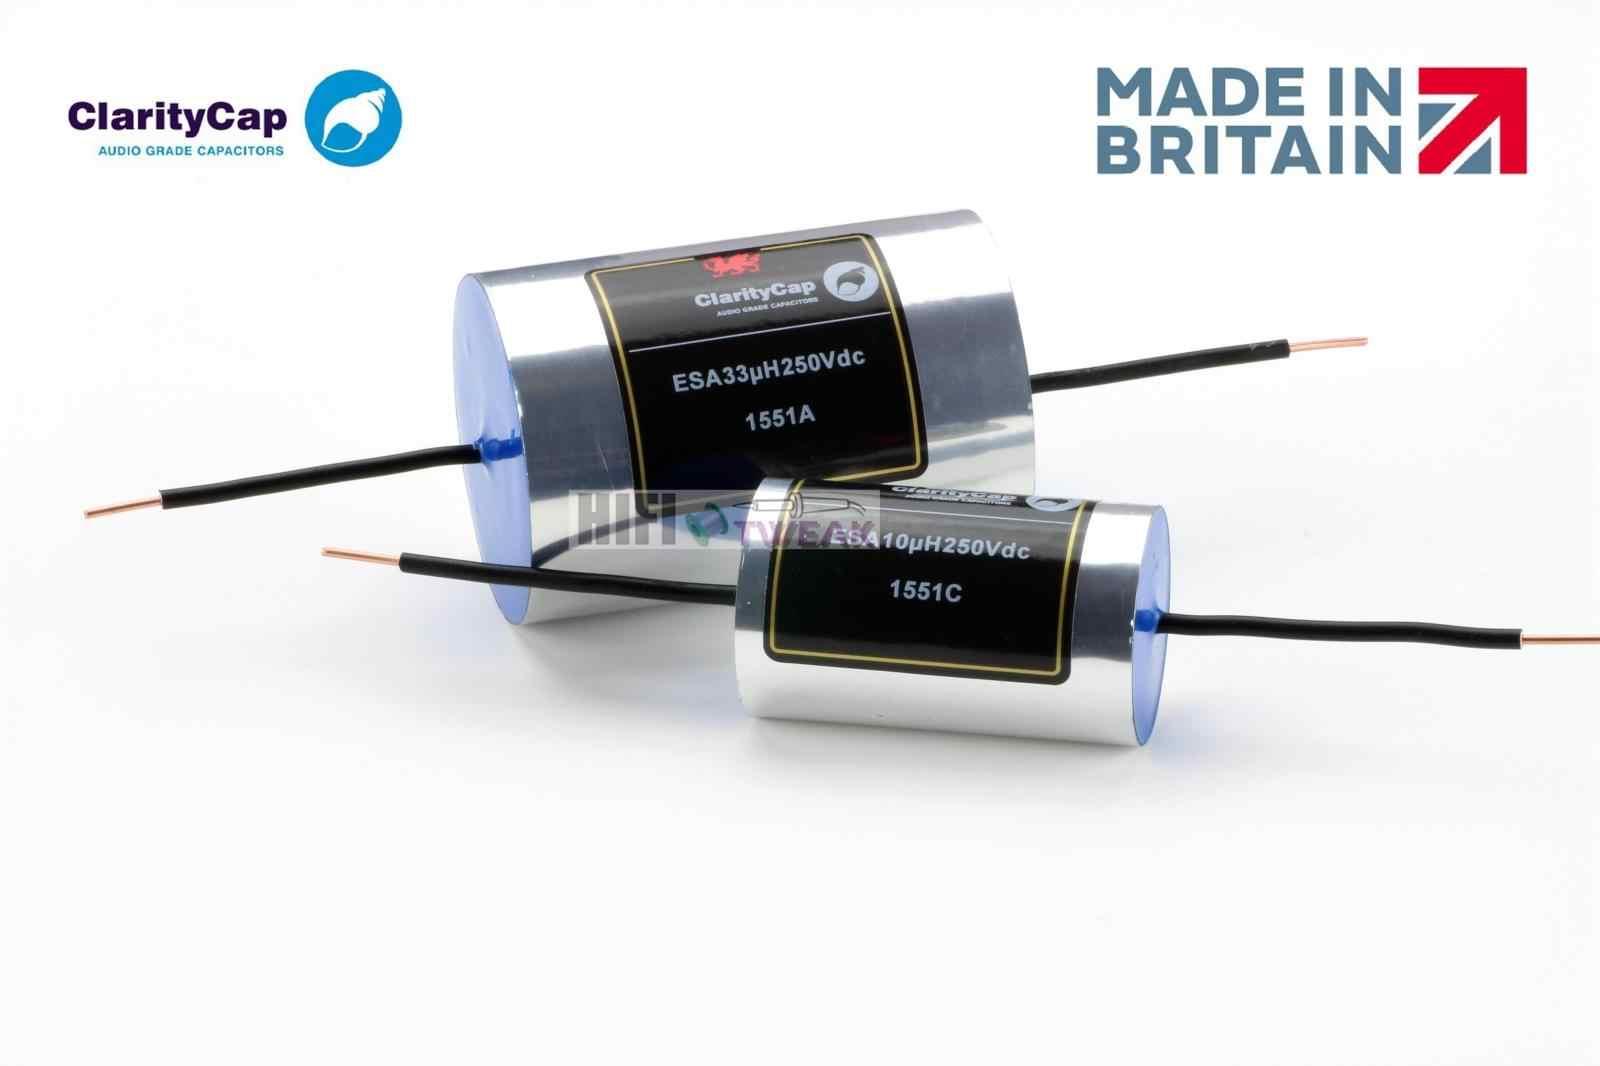 ClarityCap Series ESA 630 VDC 0.47 UF 3/% Audio Filter High End Crossover